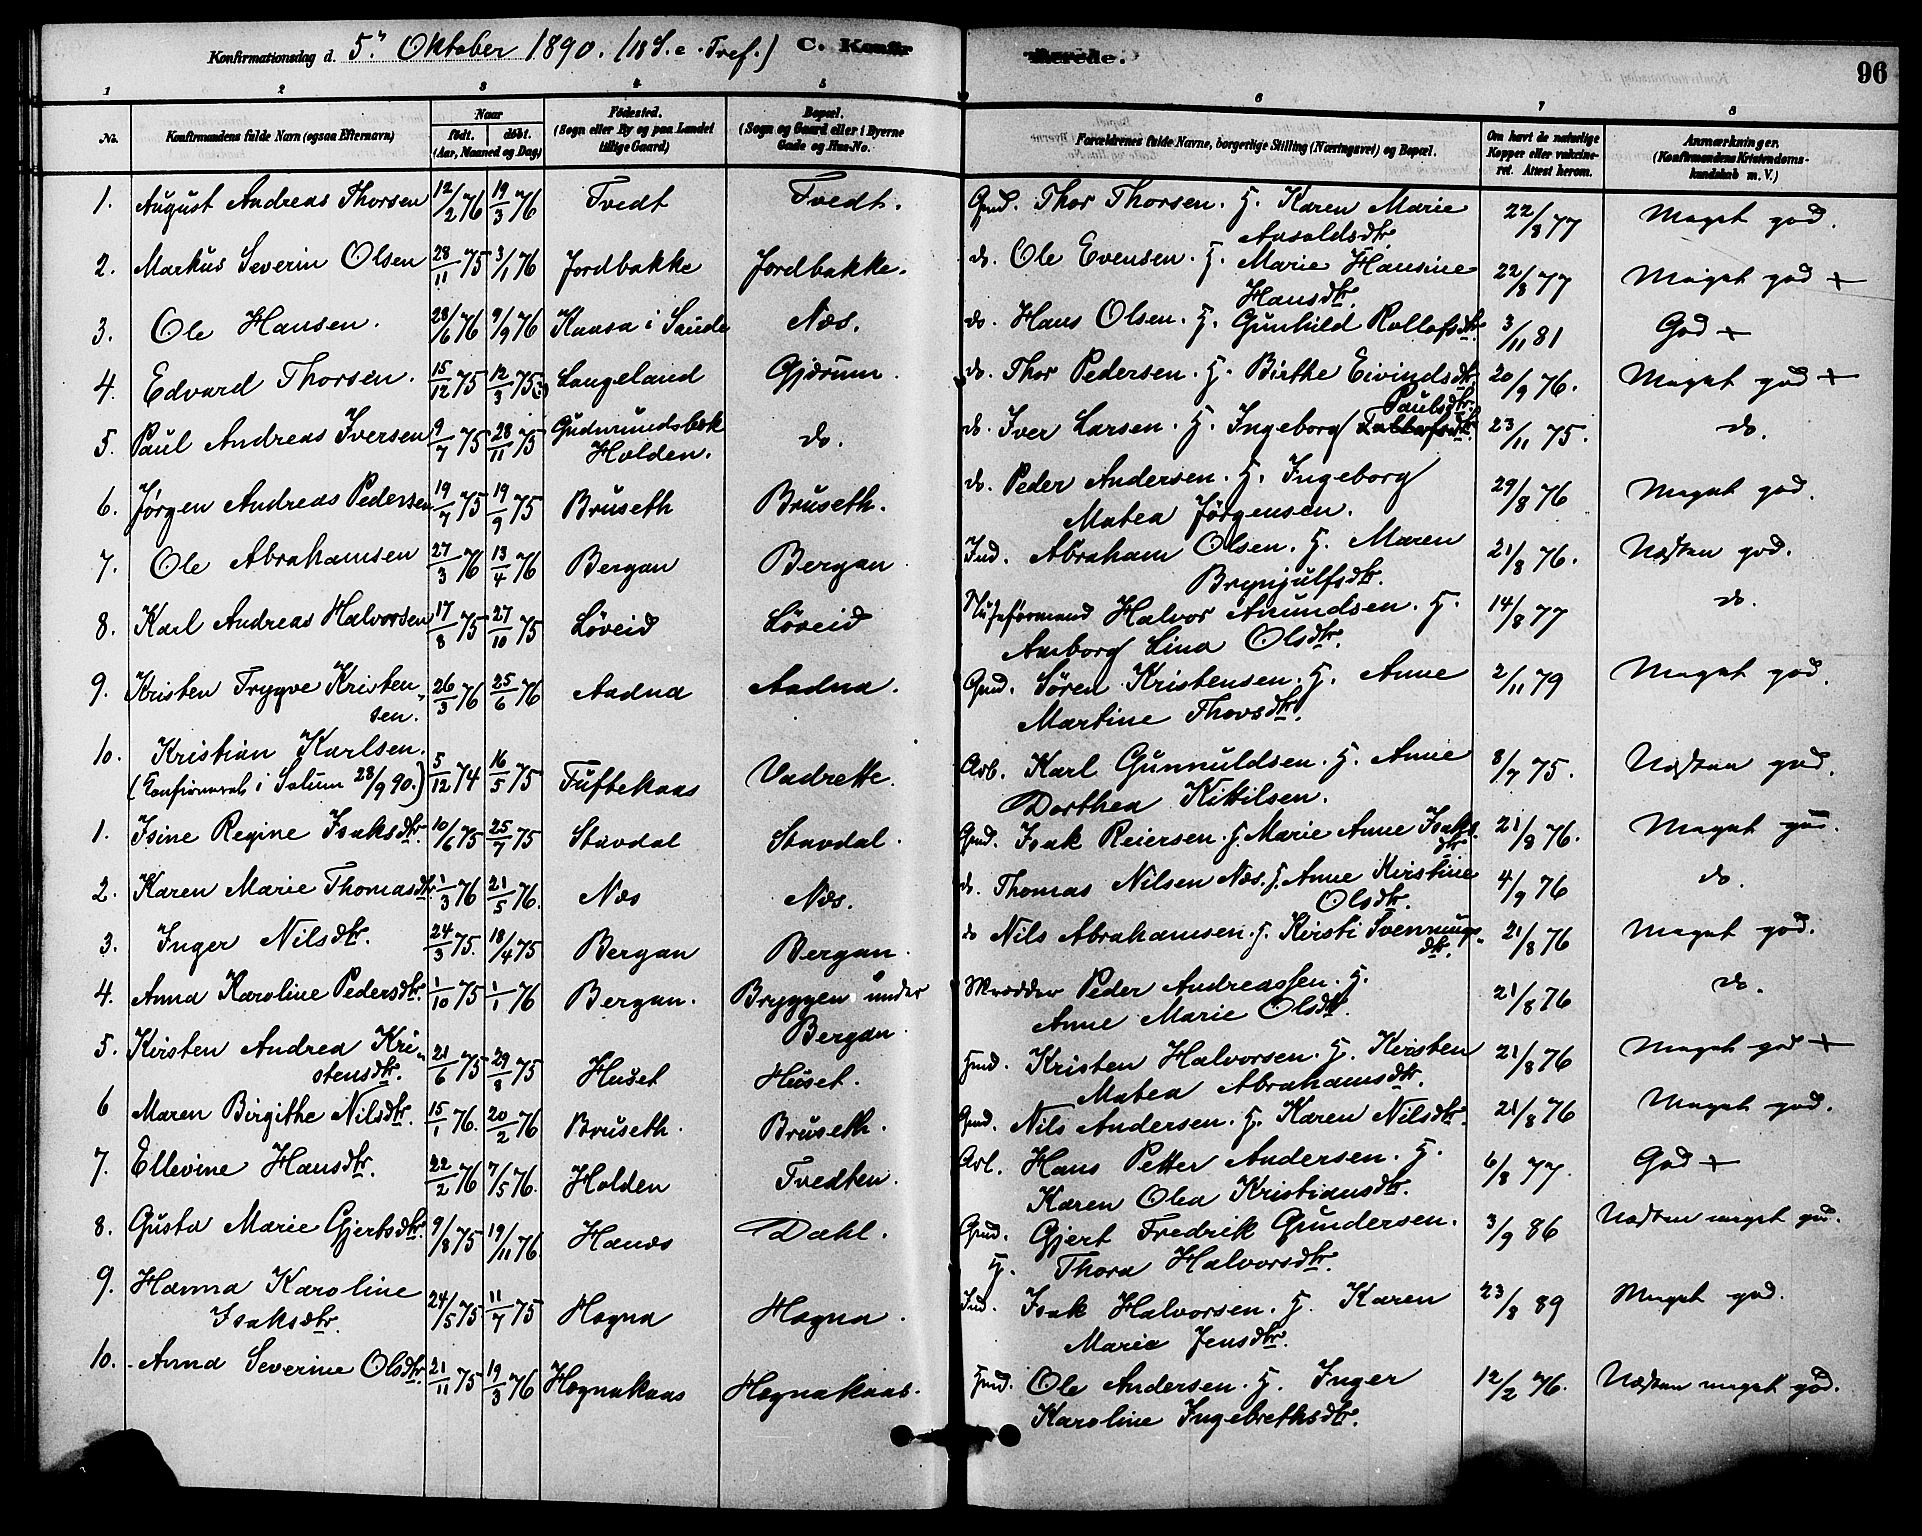 SAKO, Solum kirkebøker, F/Fb/L0001: Ministerialbok nr. II 1, 1877-1892, s. 96